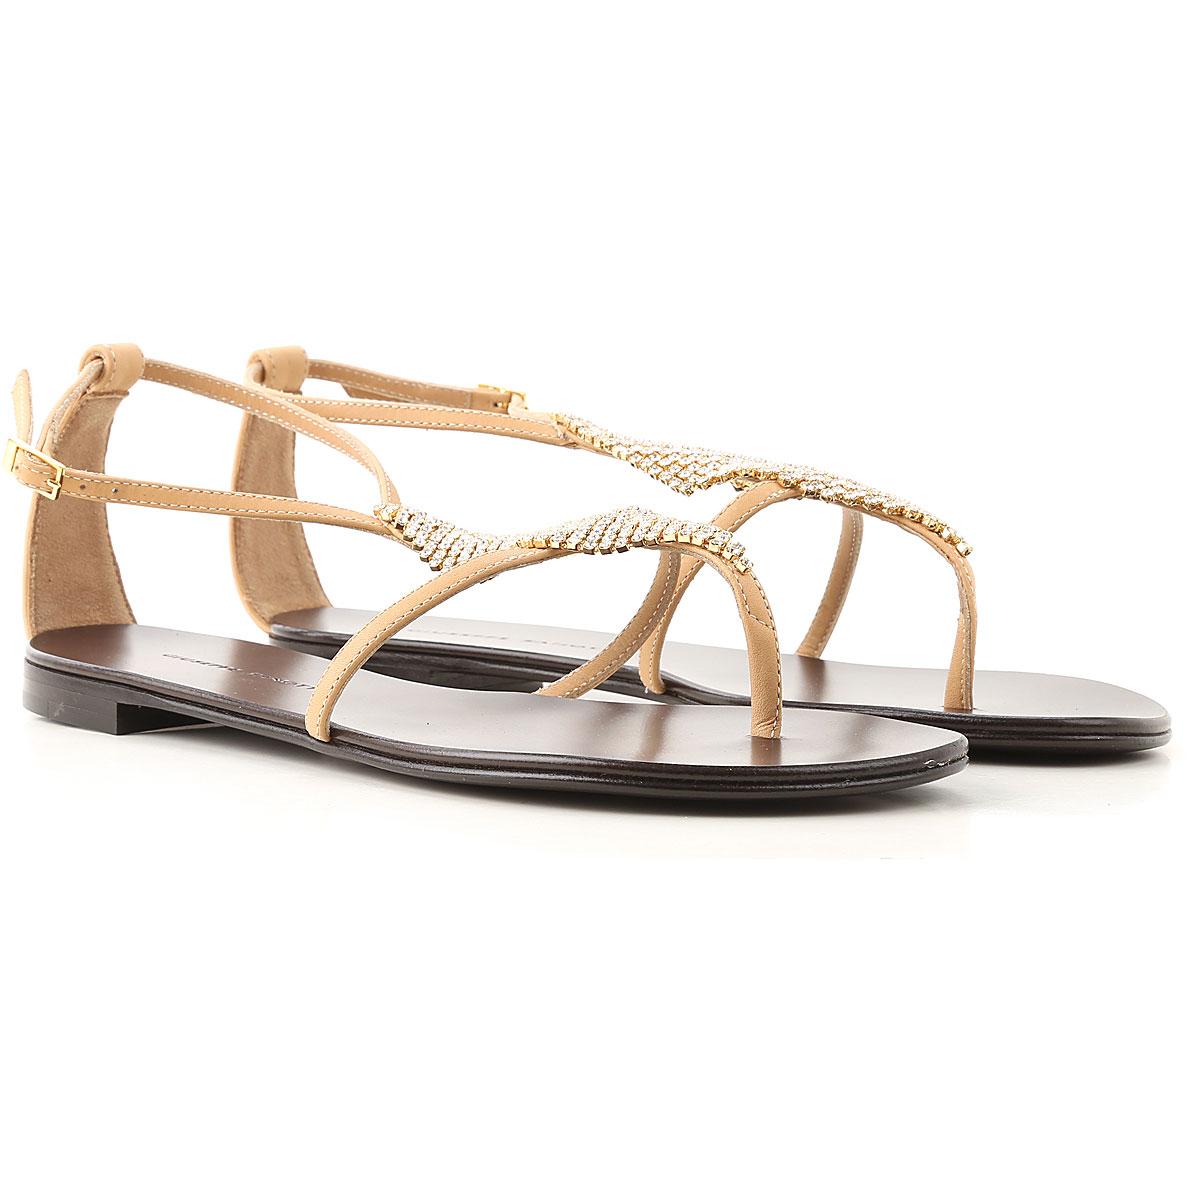 Giuseppe Zanotti Design Sandals for Women On Sale, Nude, Leather, 2019, 10 11 5.5 6 6.5 7 8 8.5 9